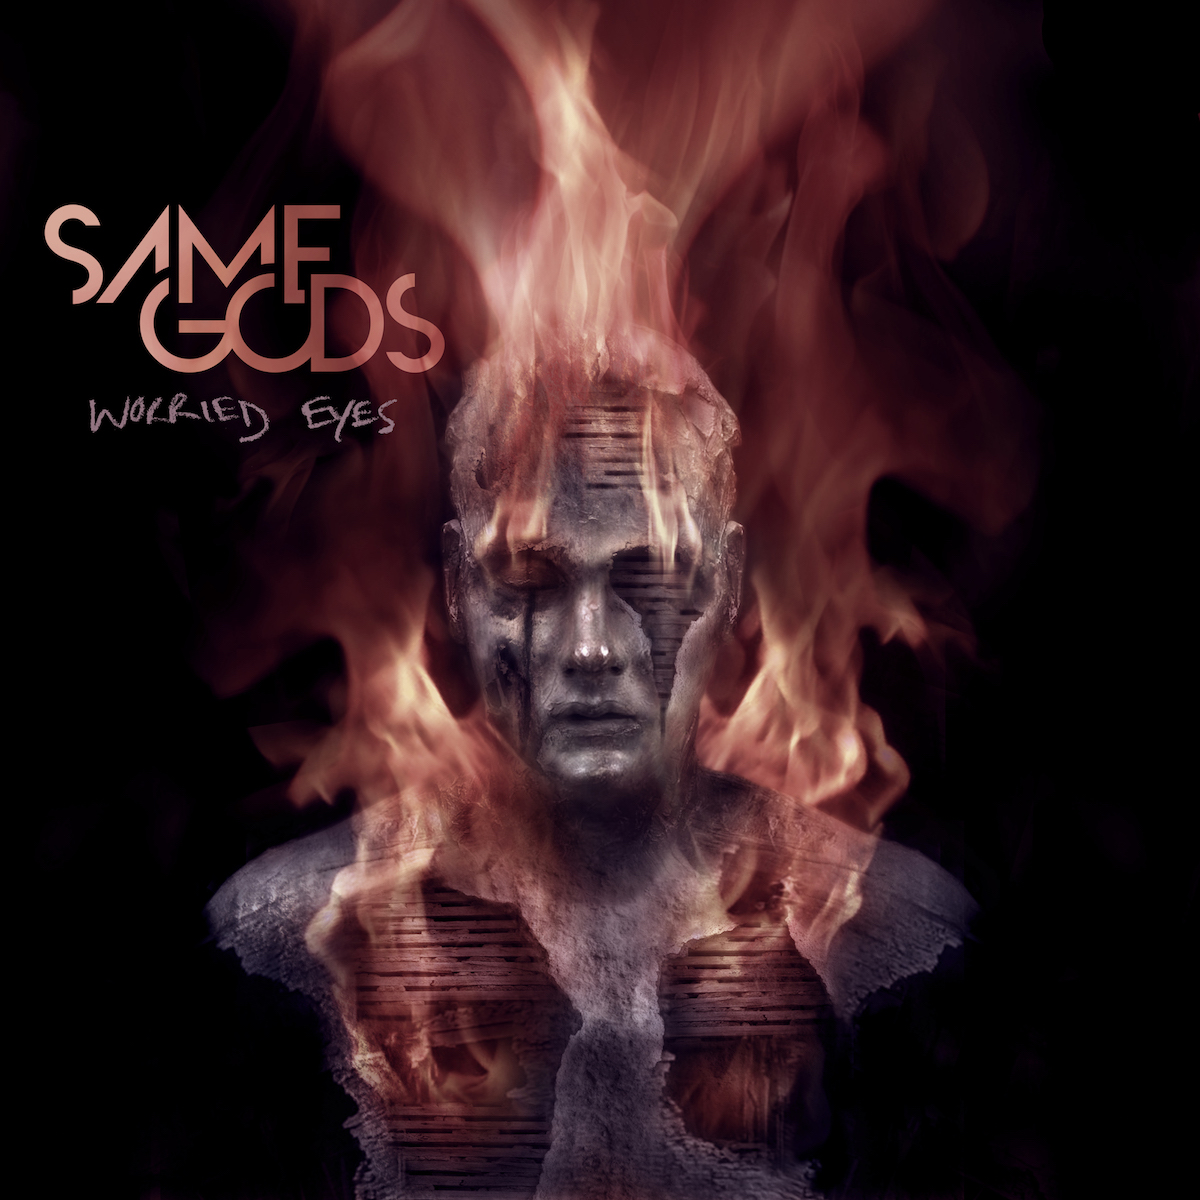 Same Gods 'Worried Eyes' cover